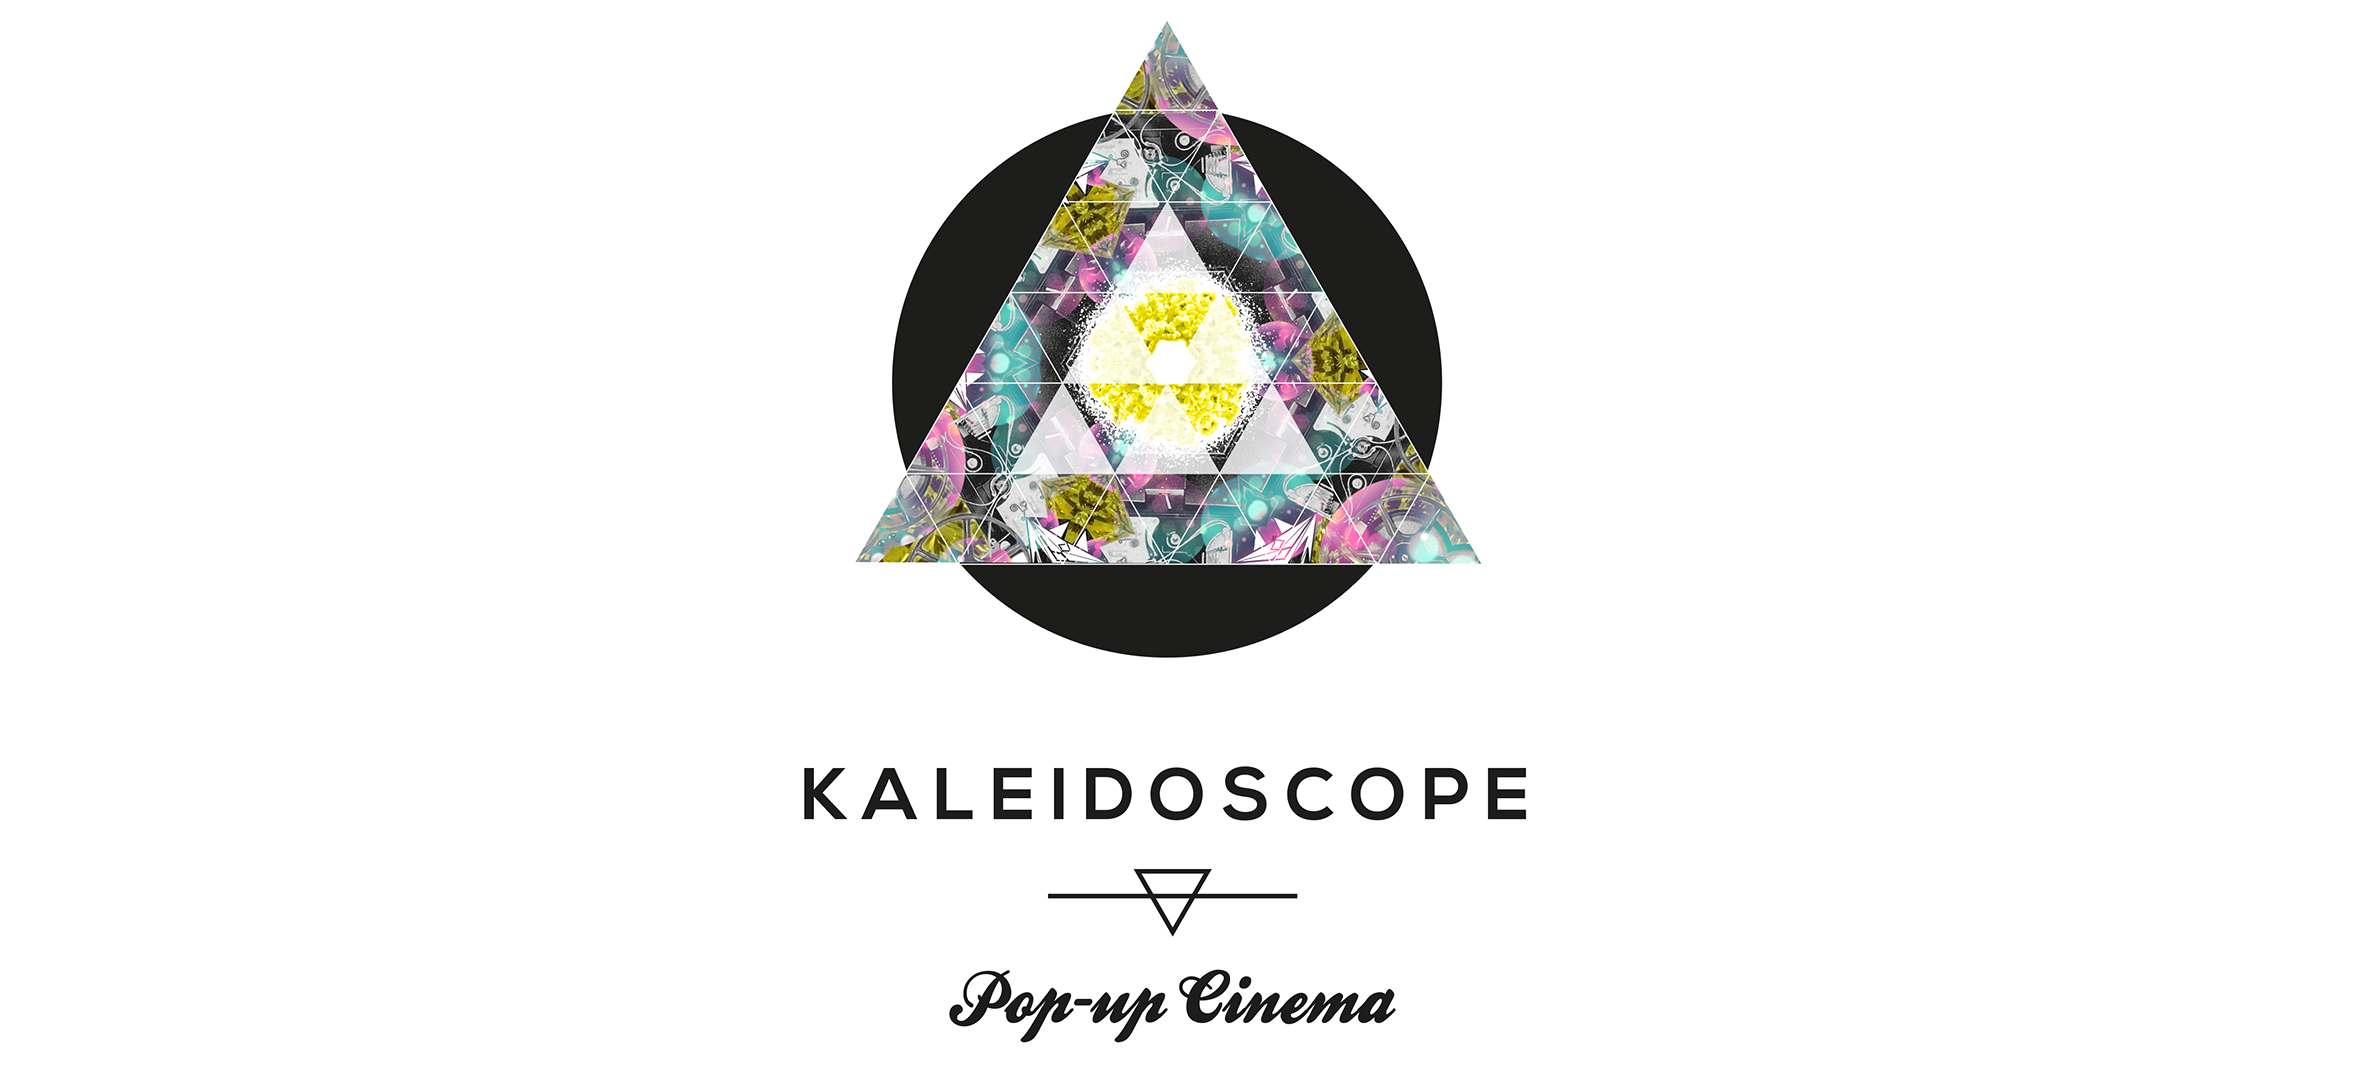 kaleidoscopic-2.jpg